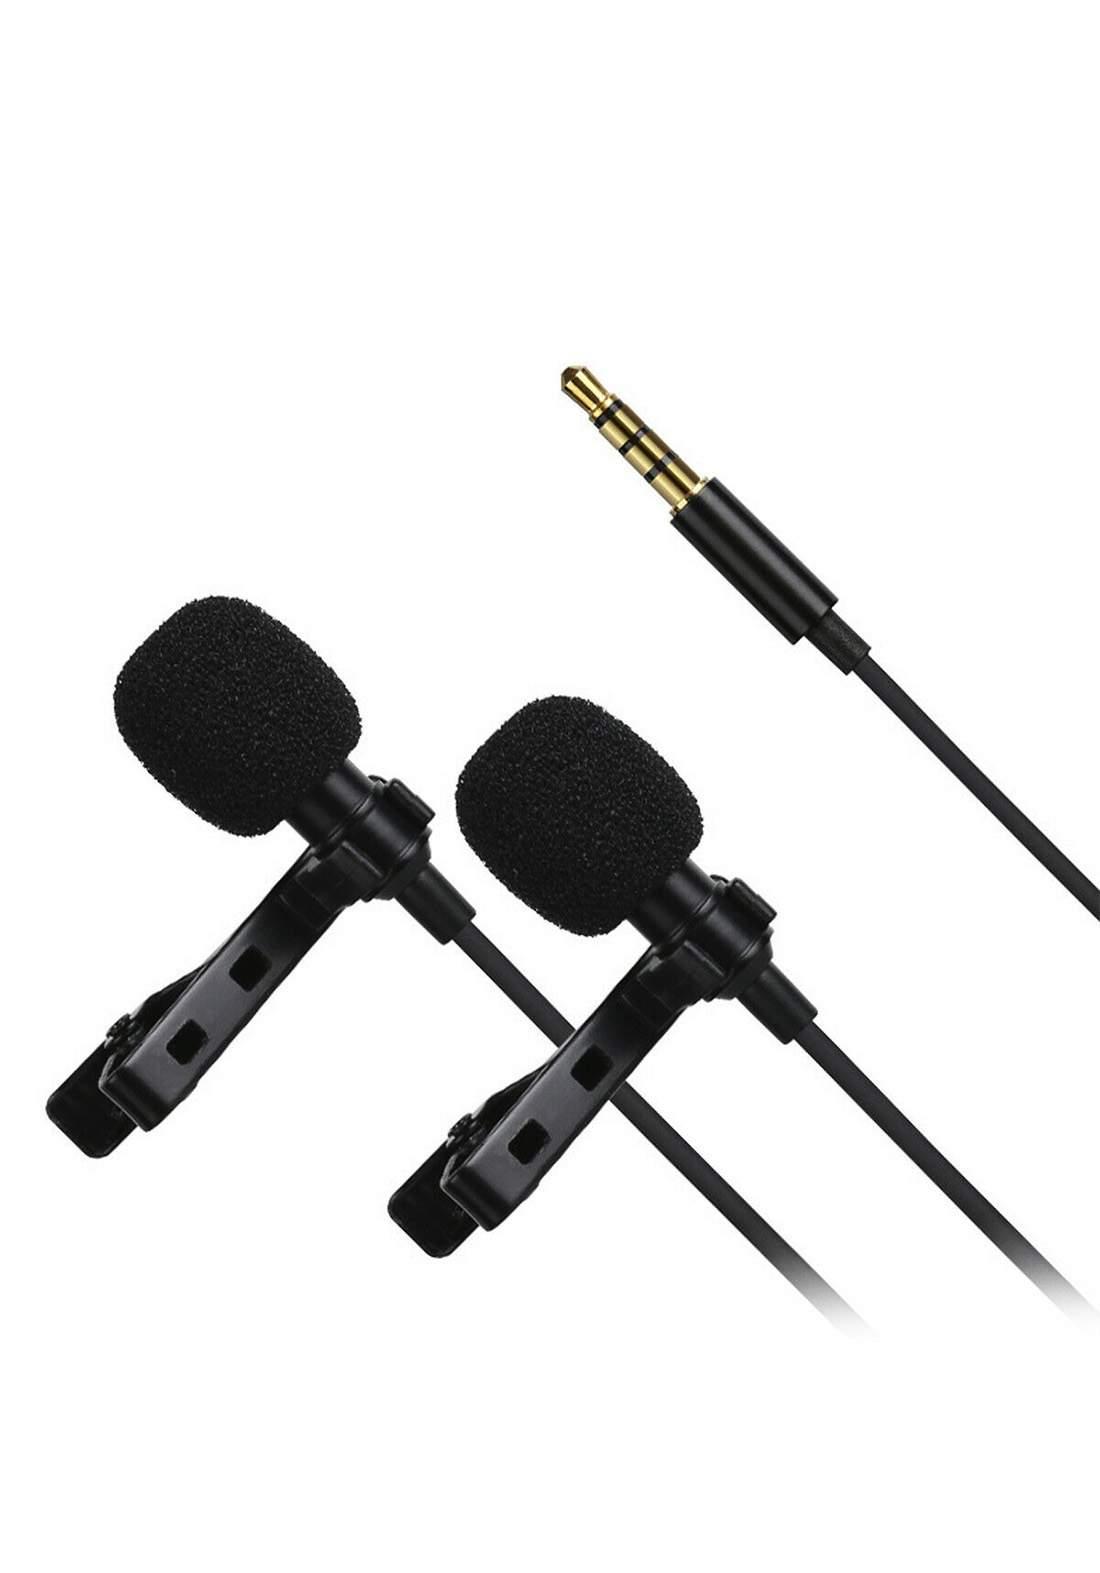 Moving Mic  Microphone Superlav Professional Omnidirectional -Black مايكروفون